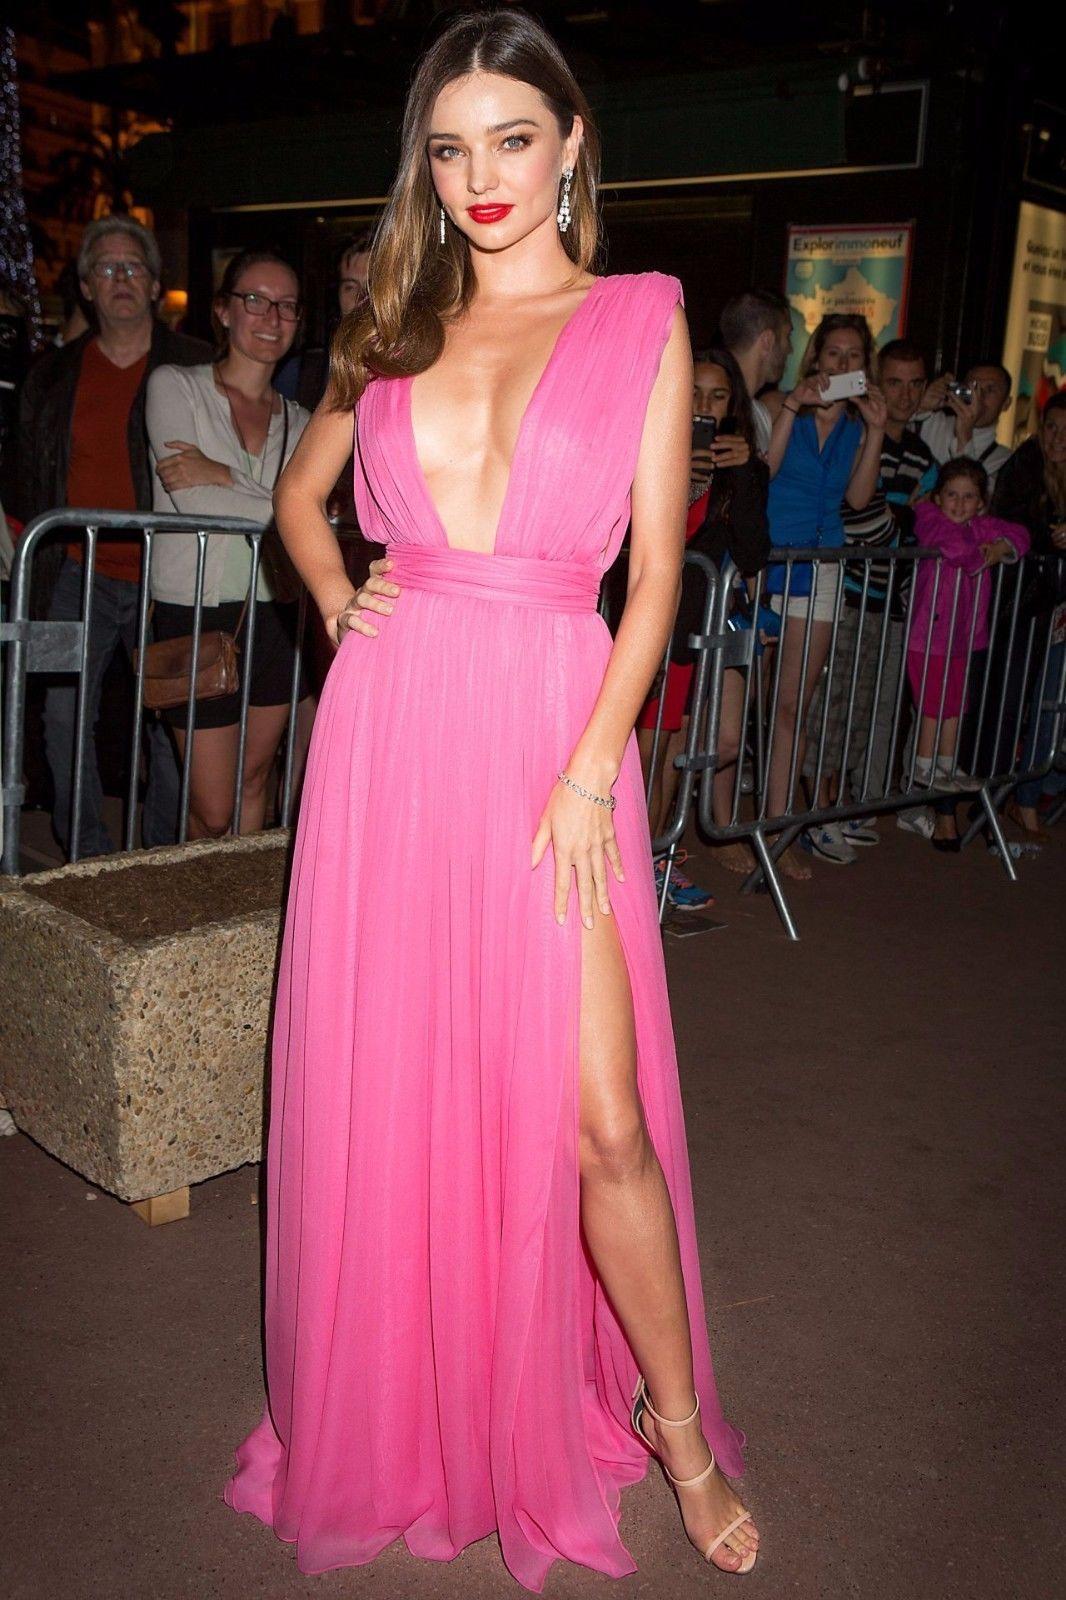 Irisan Fuchsia Pink Dress Celebrity Prom Gown Chiffon Formal Party ...